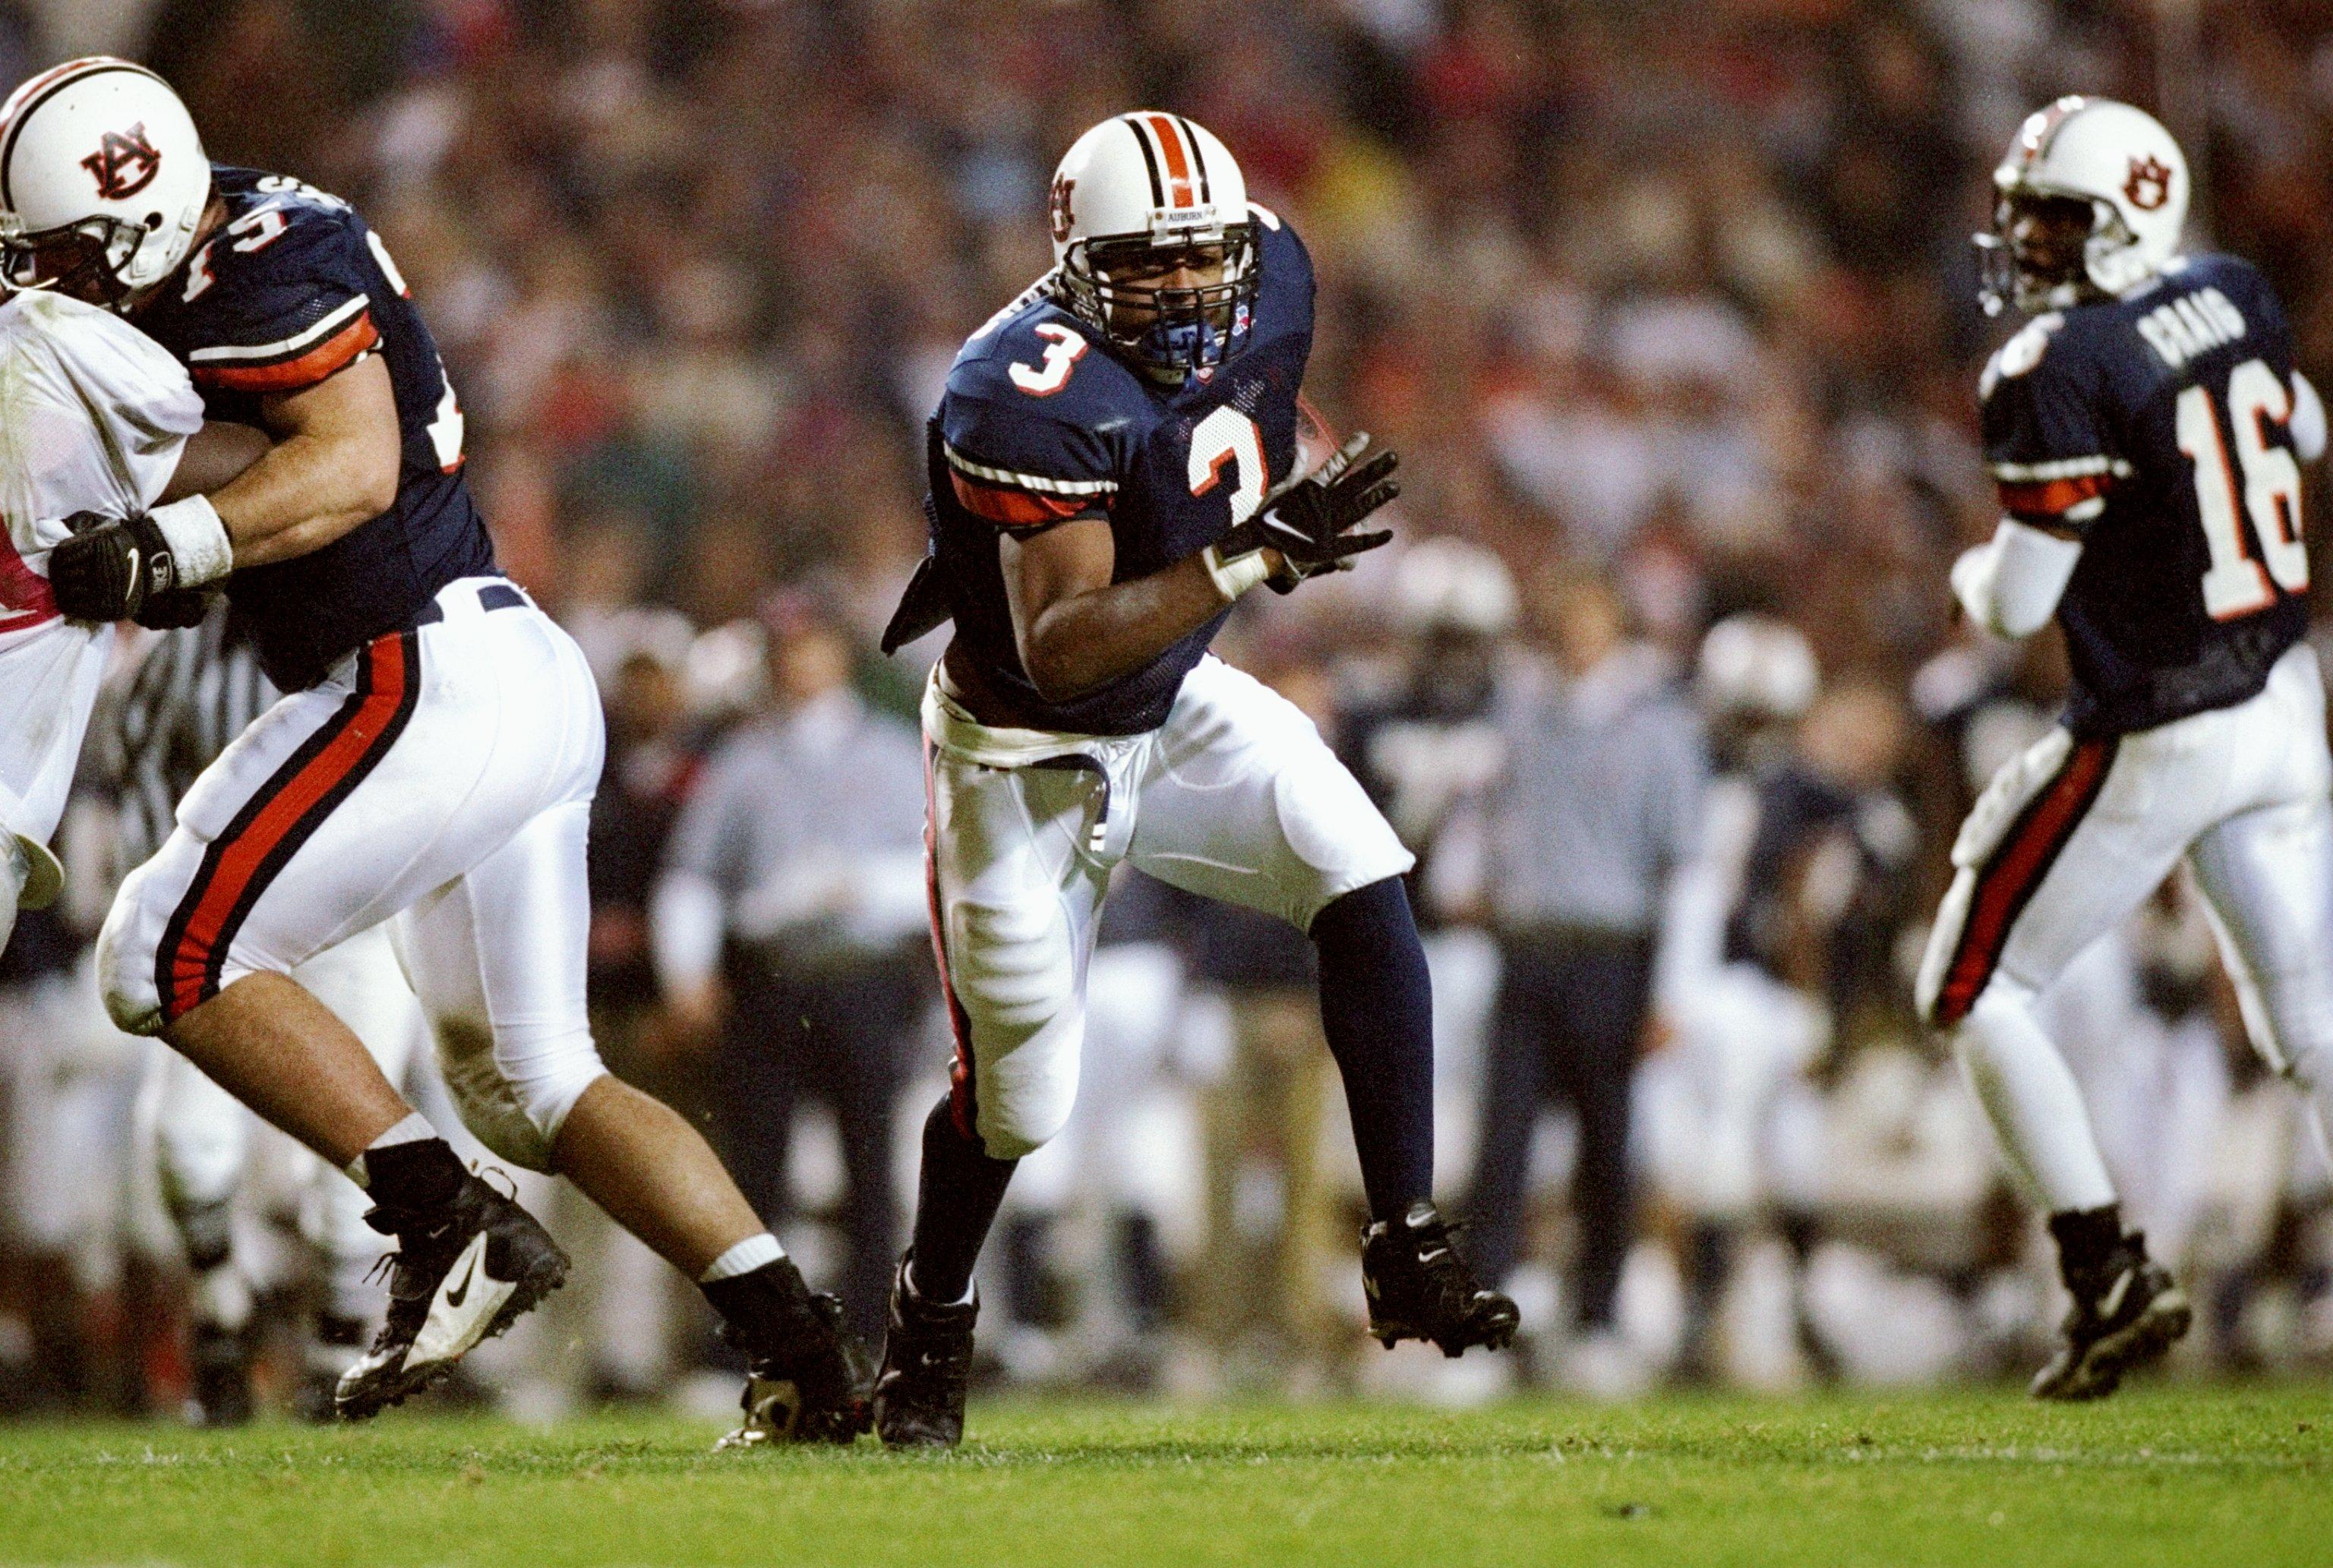 22 Nov 1997:  Tailback Rusty Williams of the Auburn Tigers (center) runs past quarterback Dameyune Craig (right) during a game against the Alabama Crimson Tide at the Jordan-Hare Stadium in Auburn, Alabama.  Auburn won the game 18-17. Mandatory Credit: An